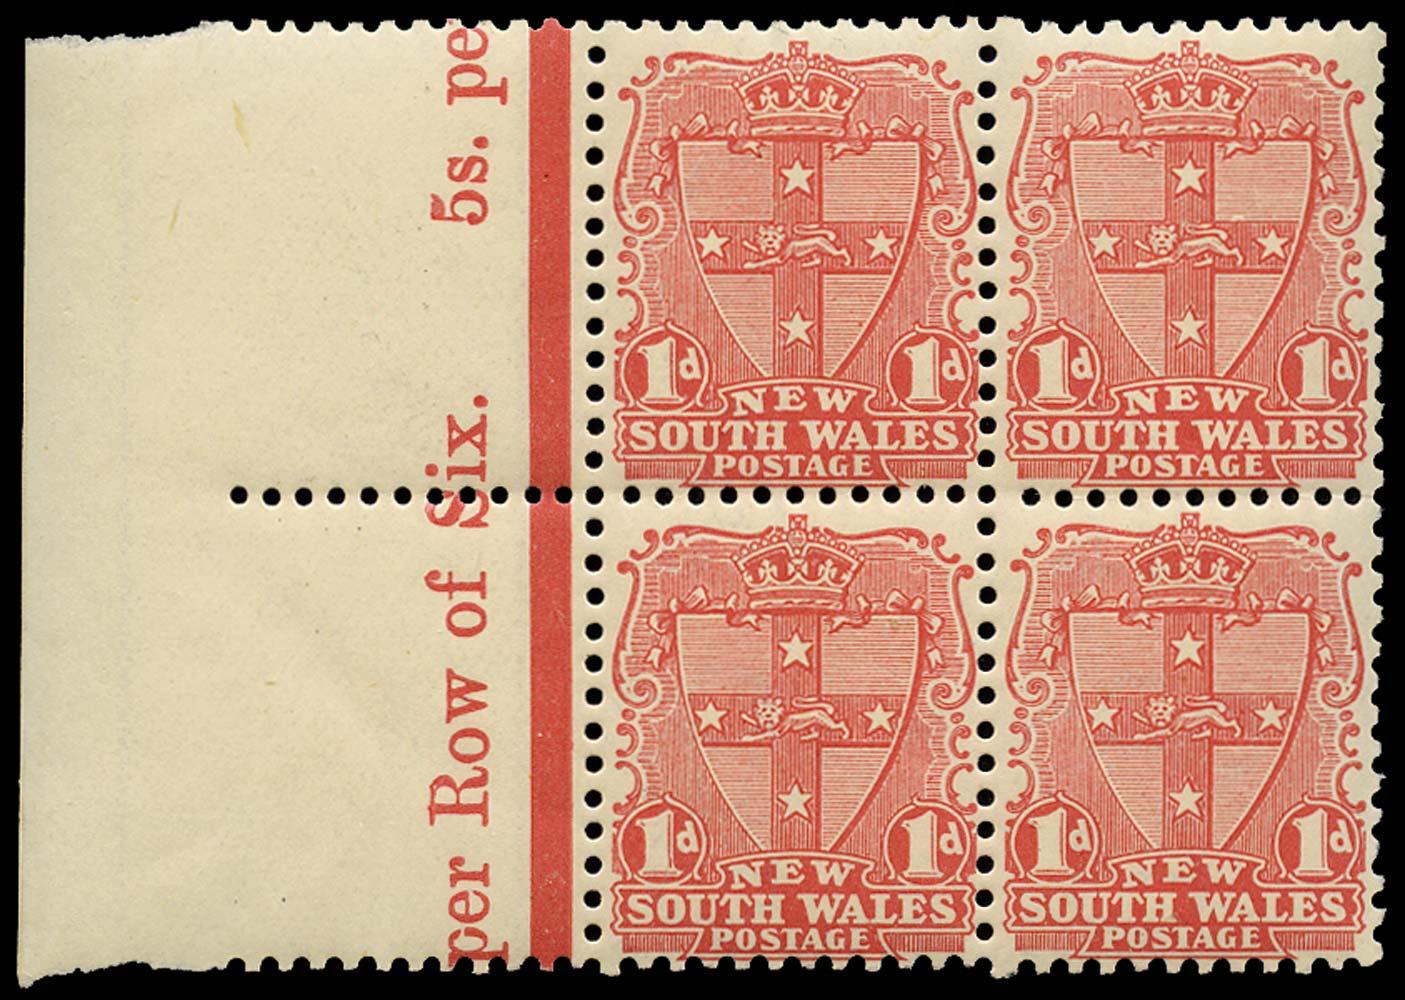 NEW SOUTH WALES 1907  SG354 Mint 1d marginal block of 4